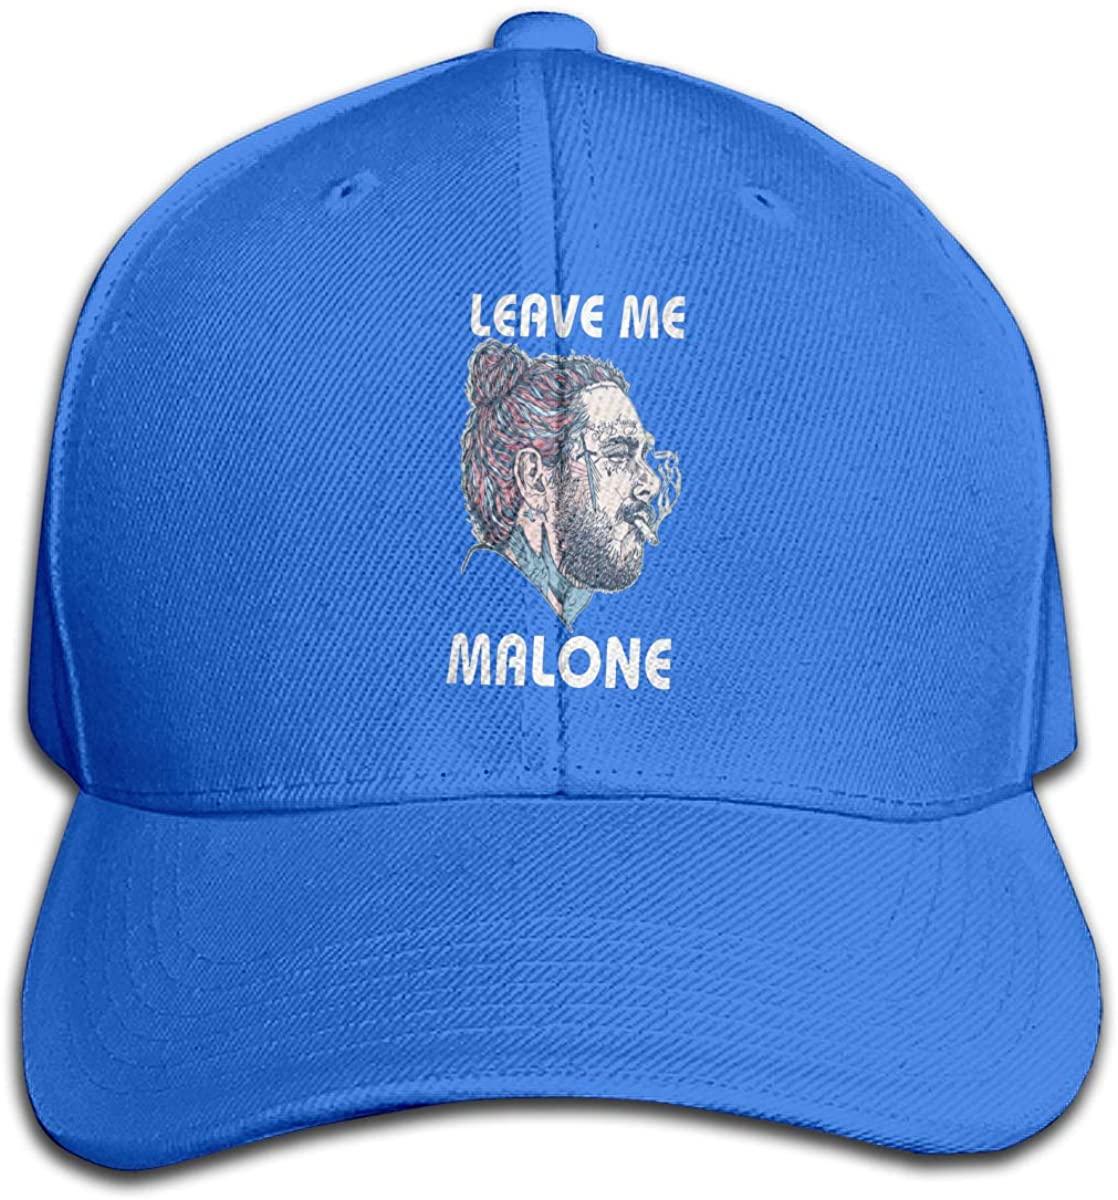 Fashion Rapper Post Leave Me Malone Comfort Dicer Black